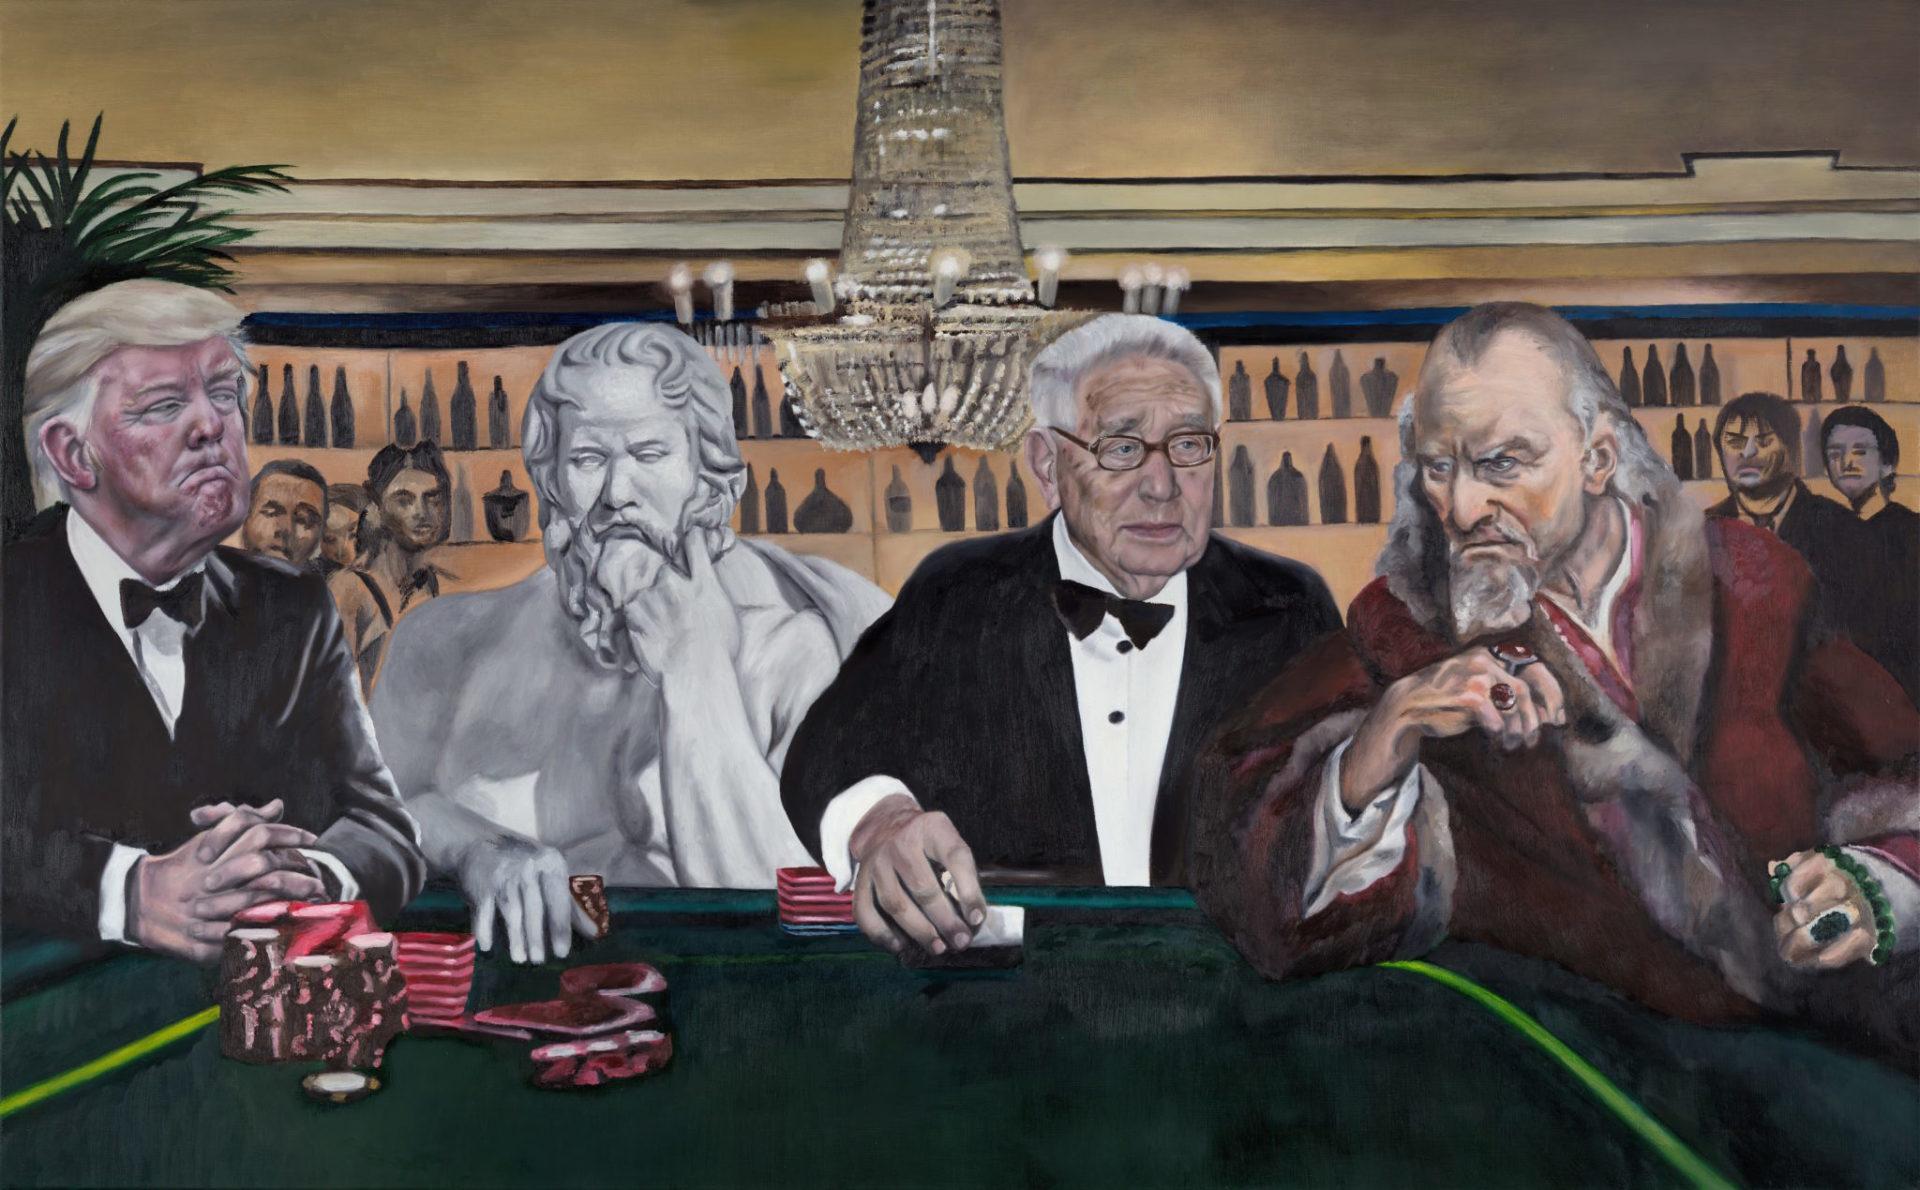 Poker — original oil art by Maria Petroff